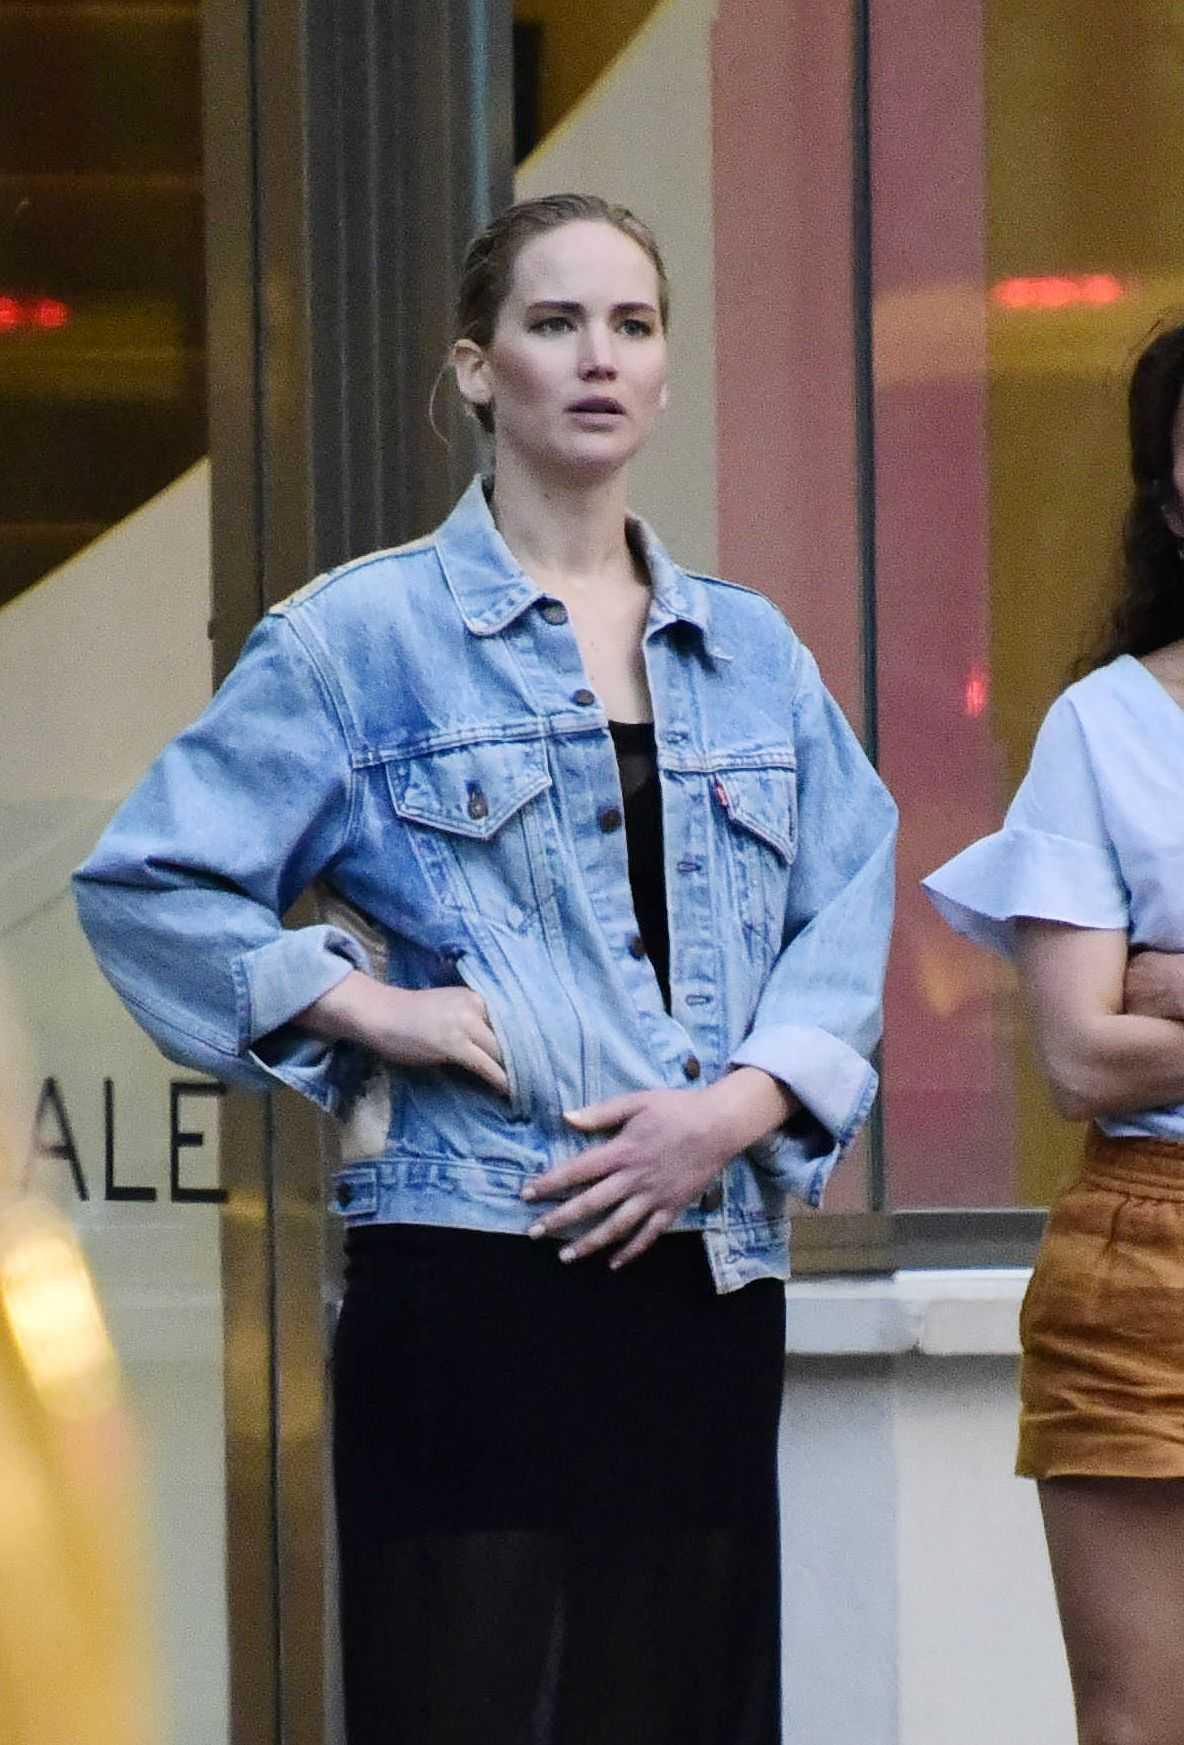 http://jenniferlawrencedaily.com/gallery/albums/userpics/10001/Jennifer_Lawrence_-_In_New_York_City_on_June_14-04.jpg